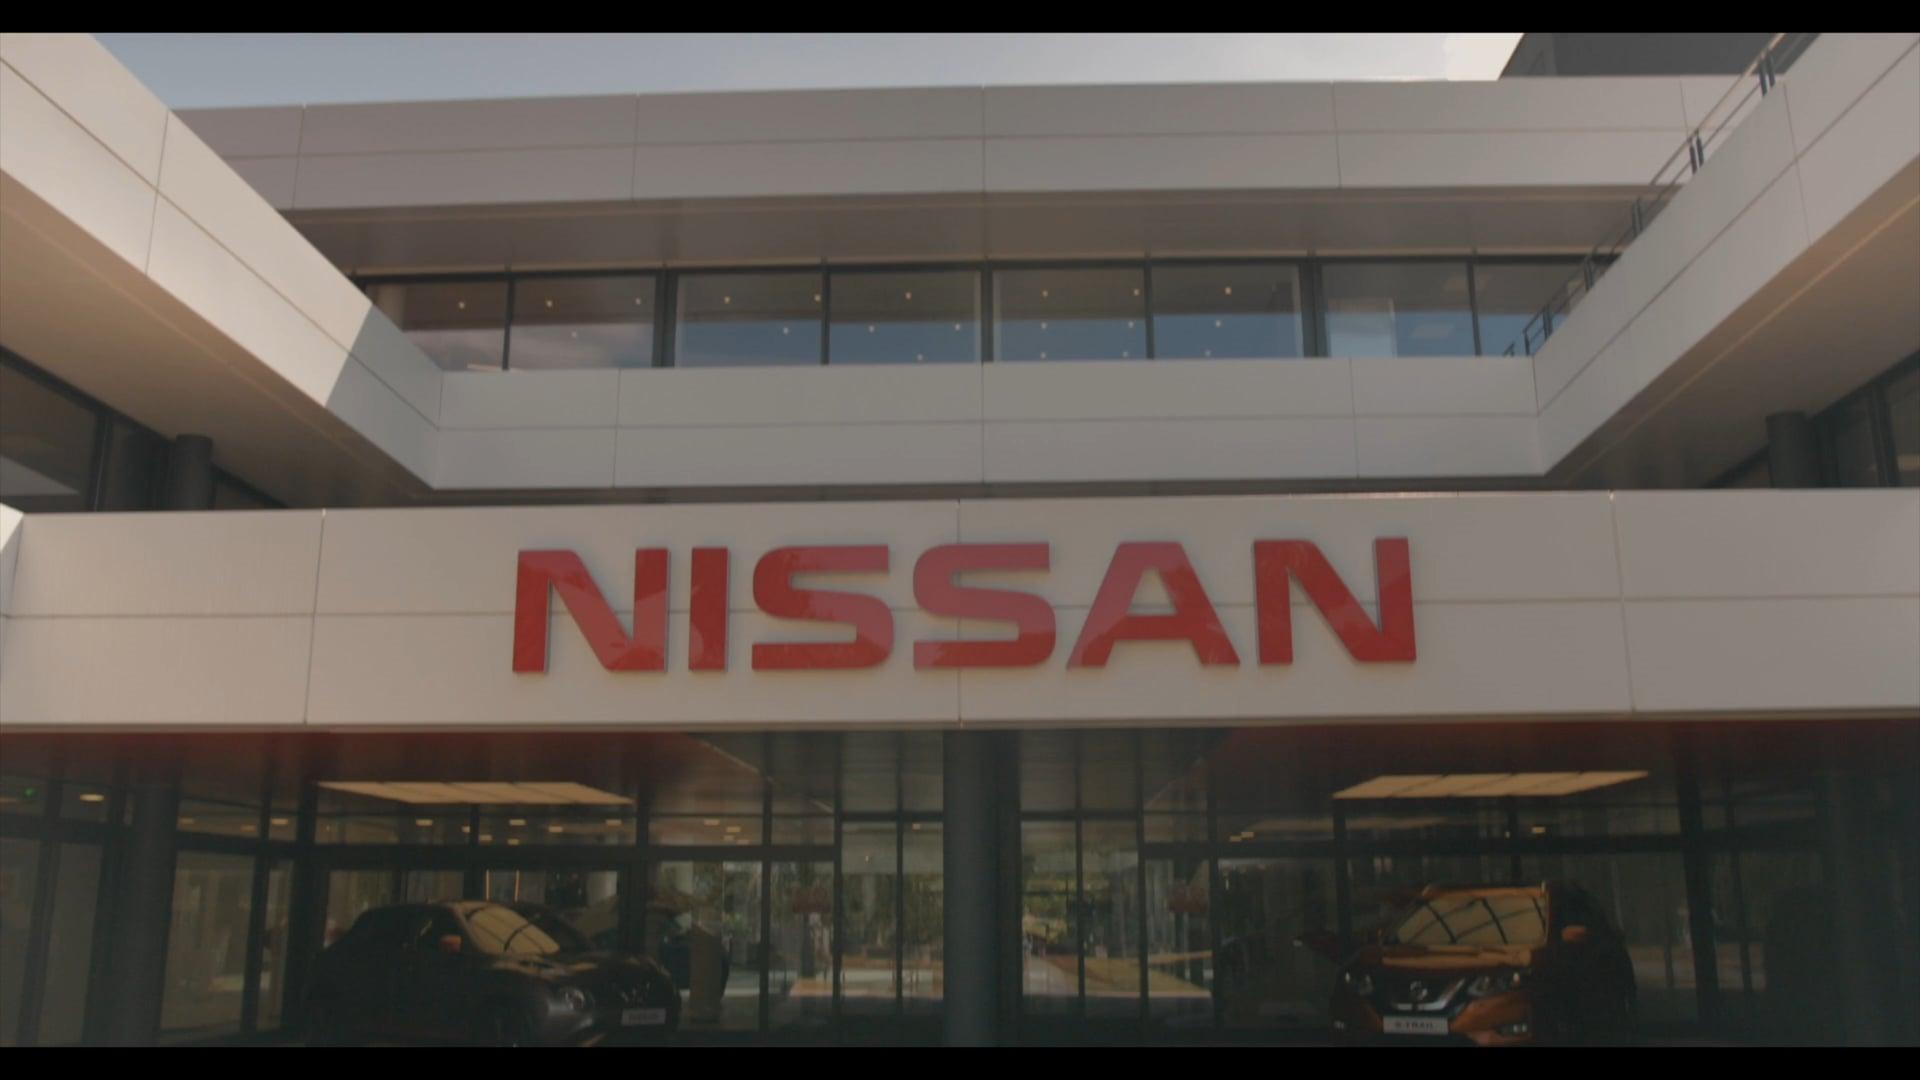 Nissport Olympic Games 2018 @ Nissan France HQ